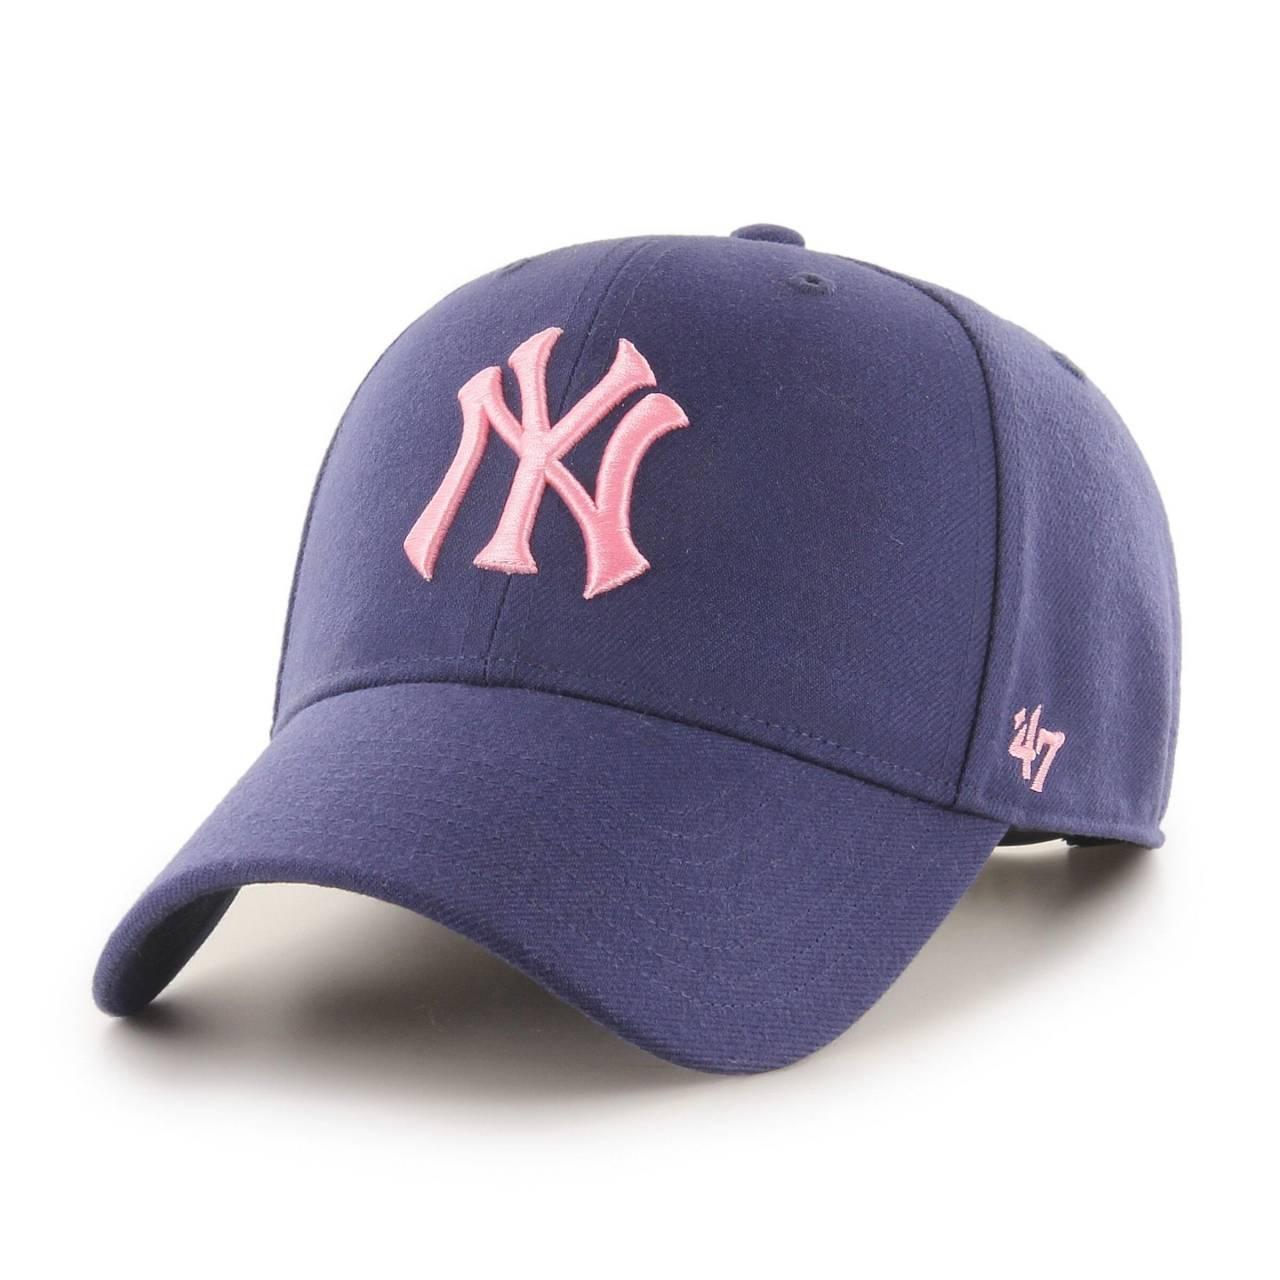 MLB NEW YORK YANKEES '47 MVP SNAPBACK NAVY